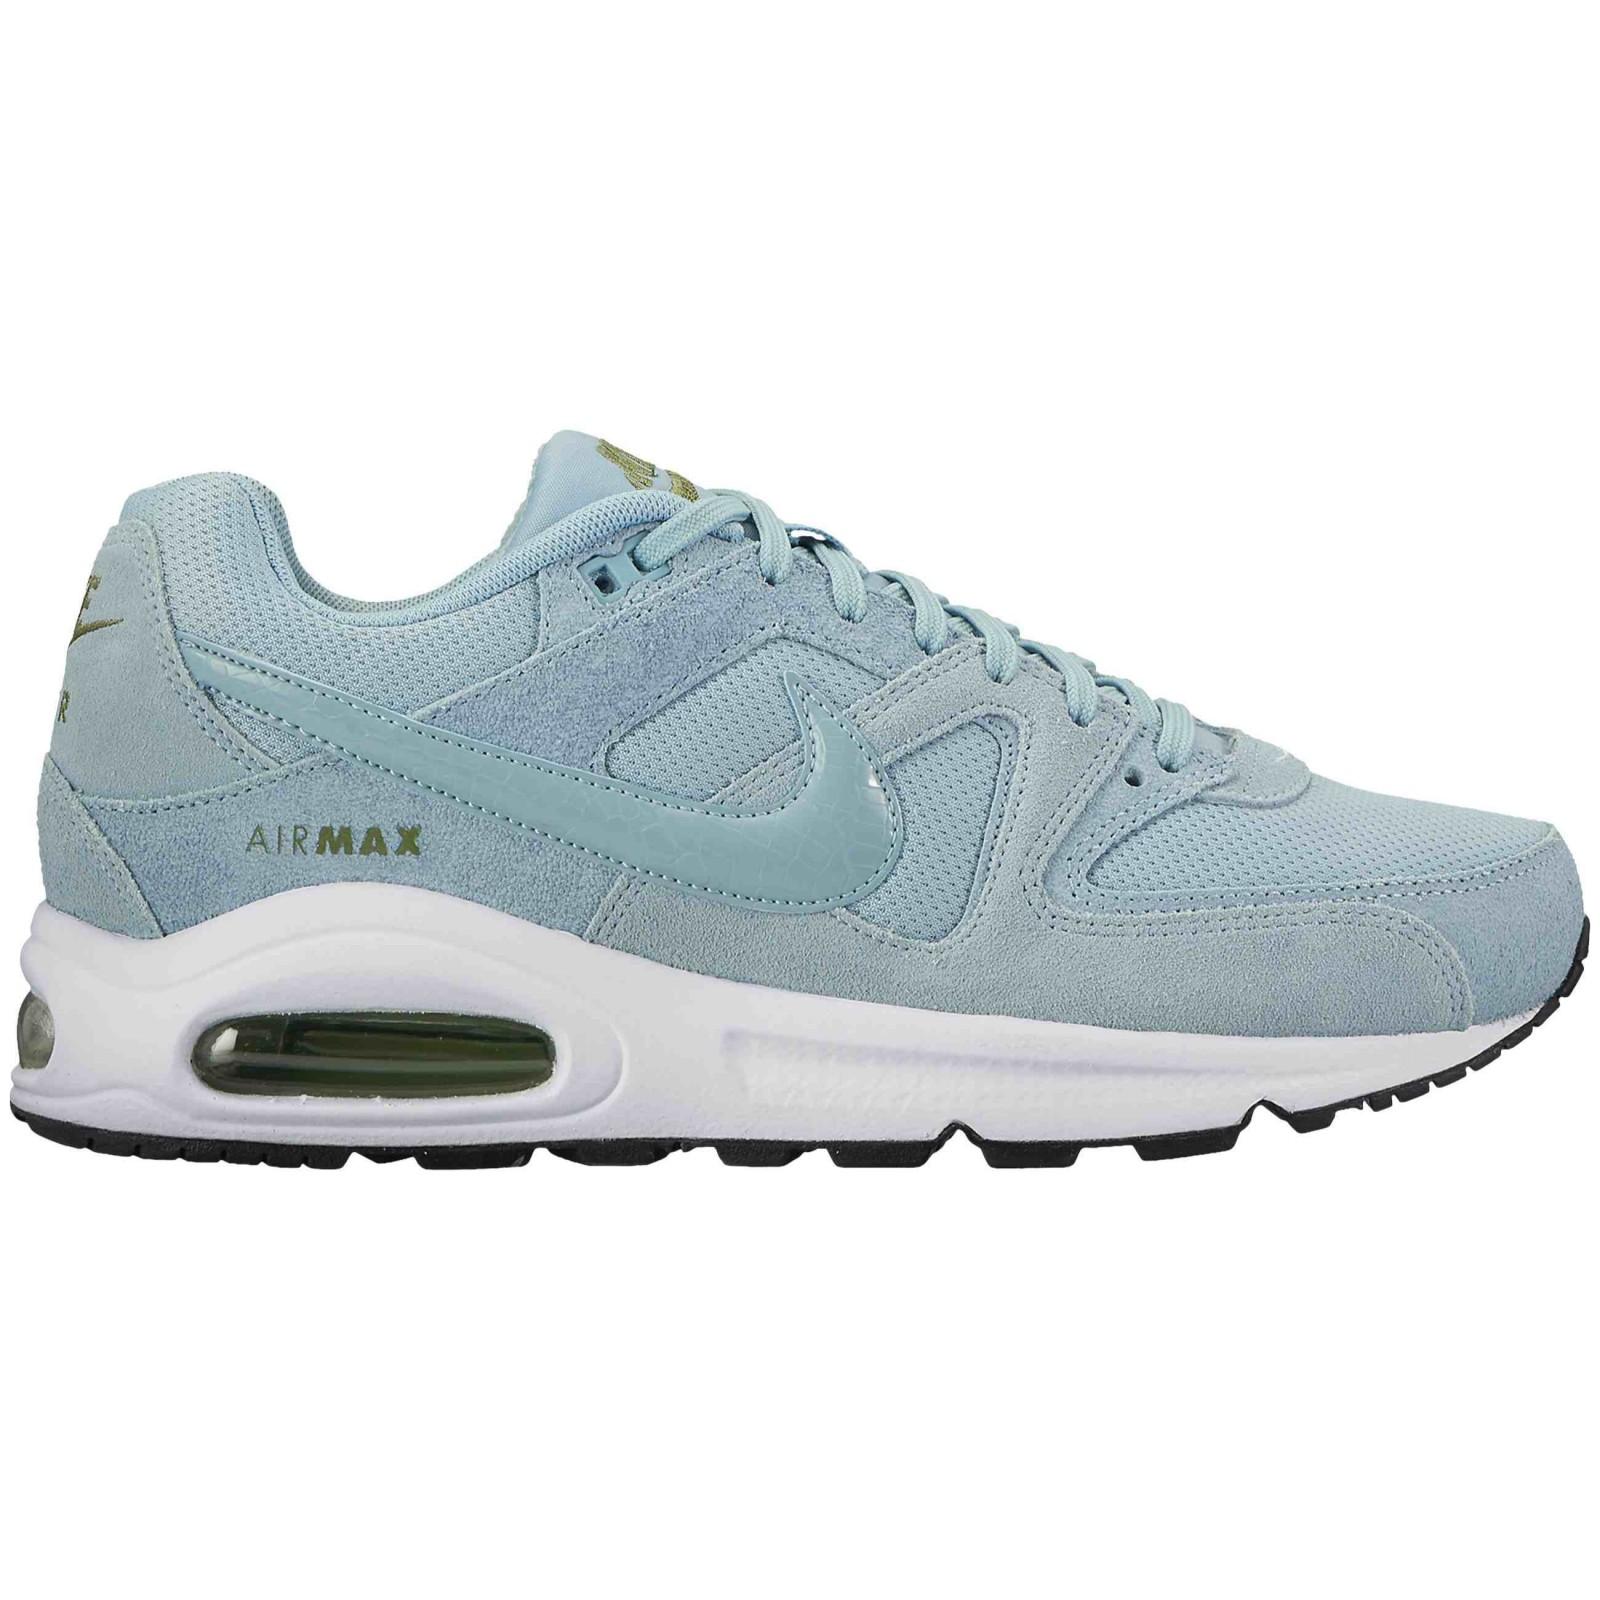 278f89ceb54 Dámské tenisky Nike WMNS AIR MAX COMMAND